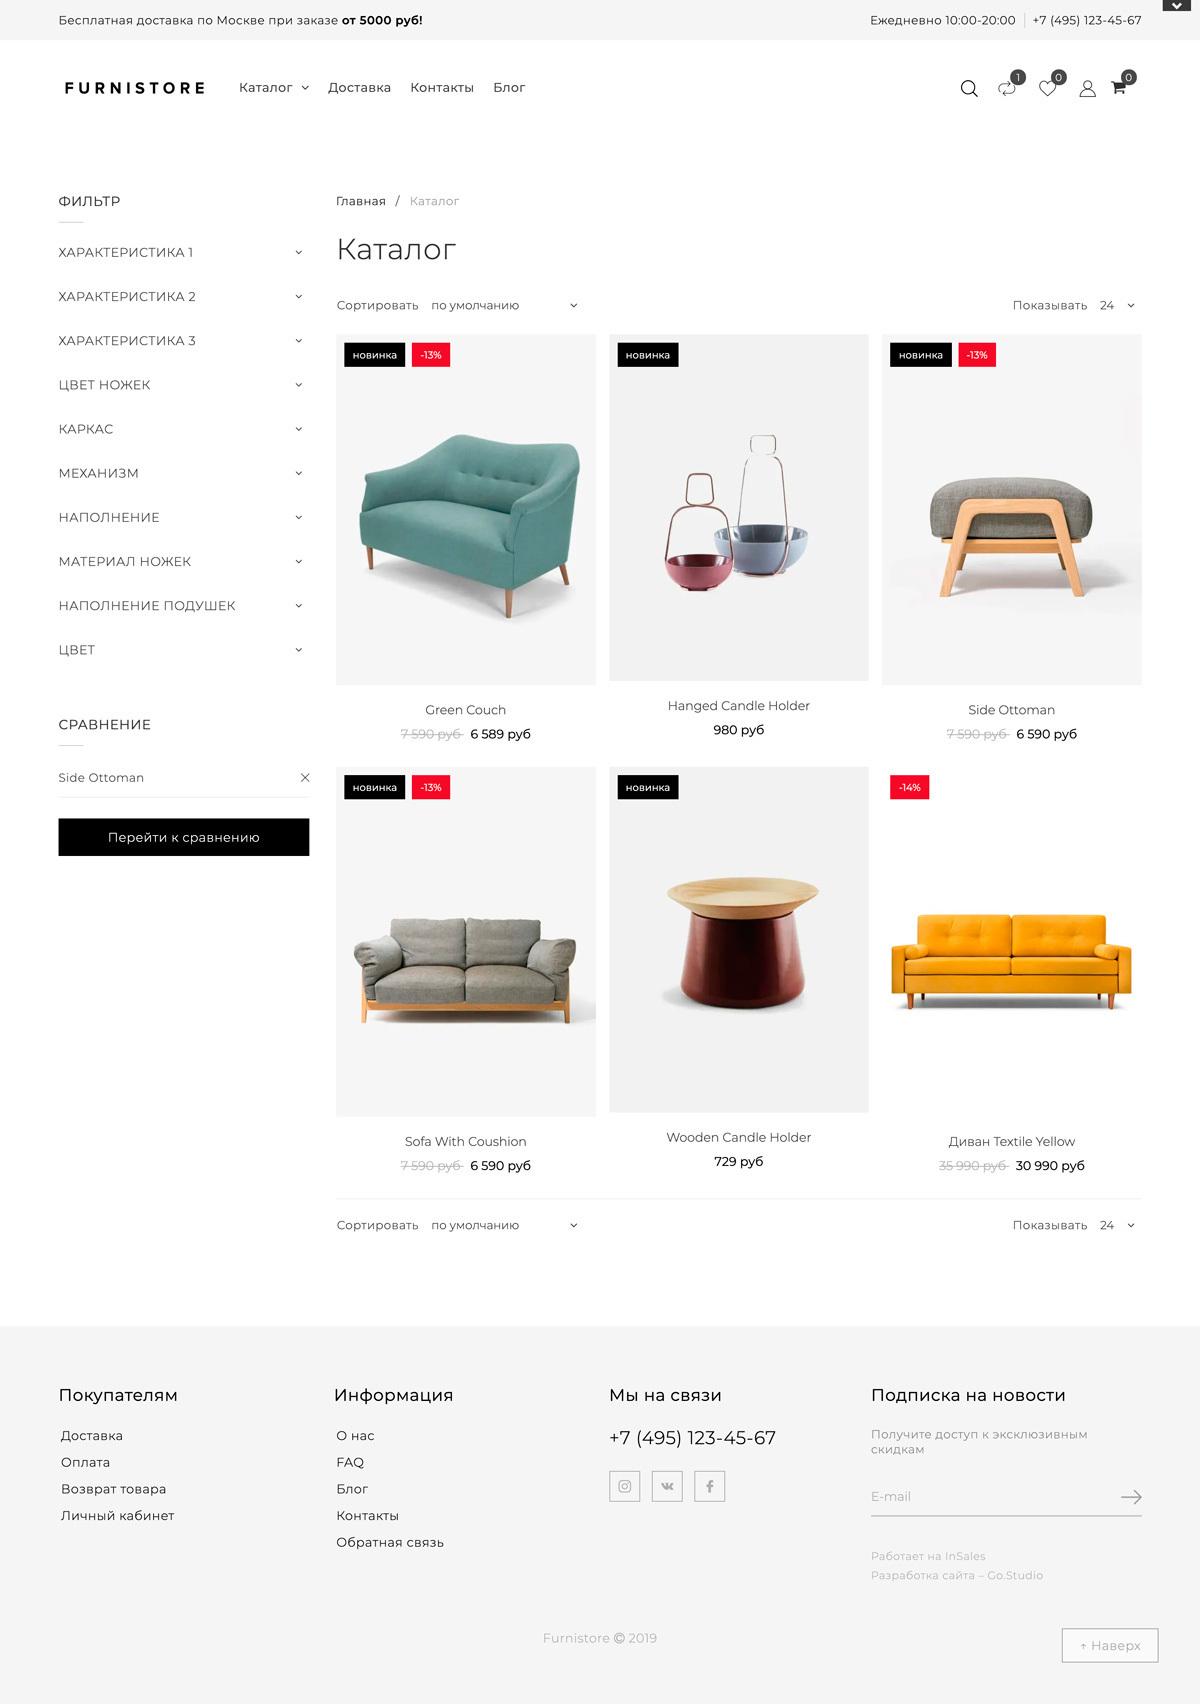 Шаблон интернет магазина - Furnistore